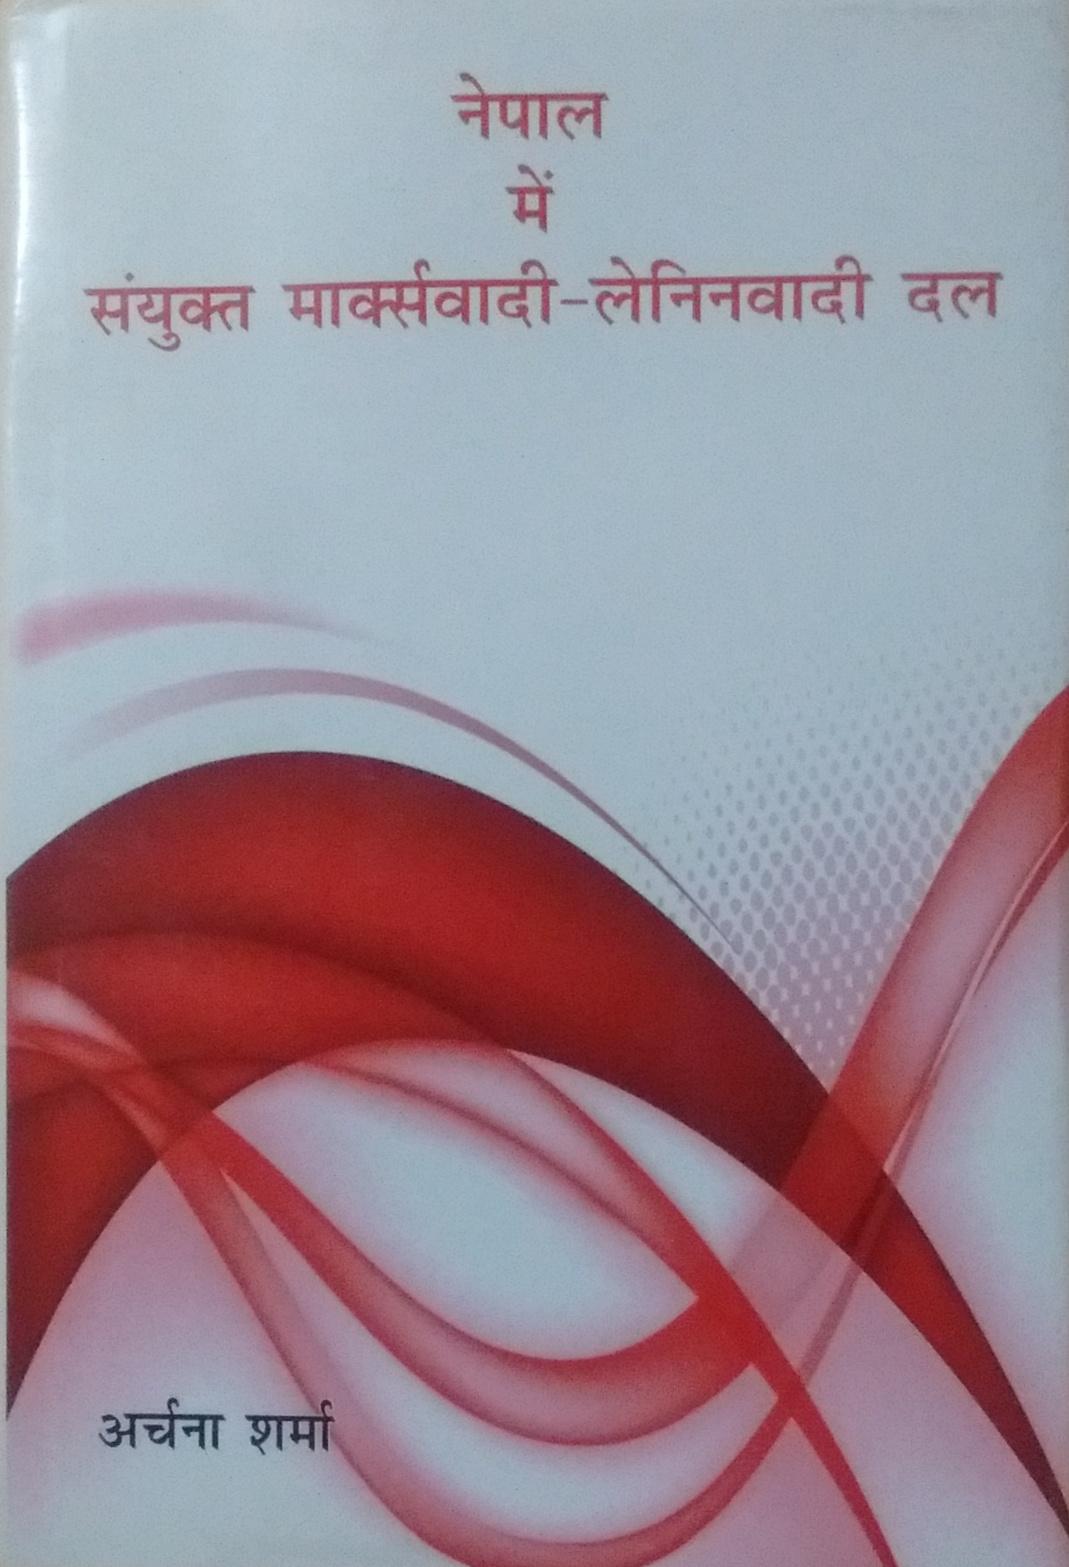 Nepal me Sanyukt Marxwadi Leninwadi Dal (Hindi)